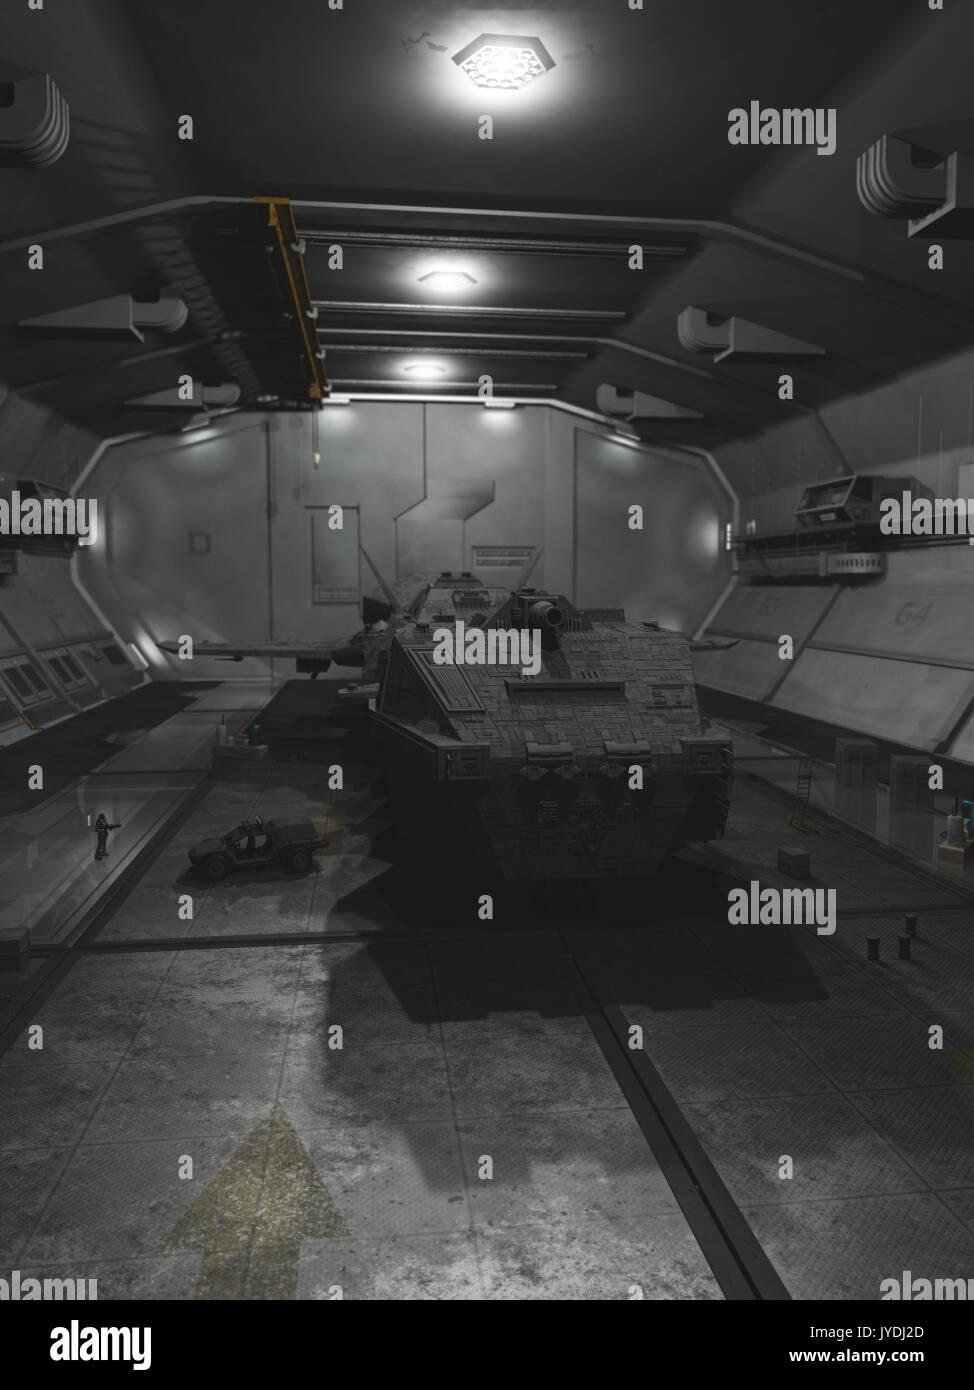 Interplanetary Spaceship in Repair Dock - Stock Image